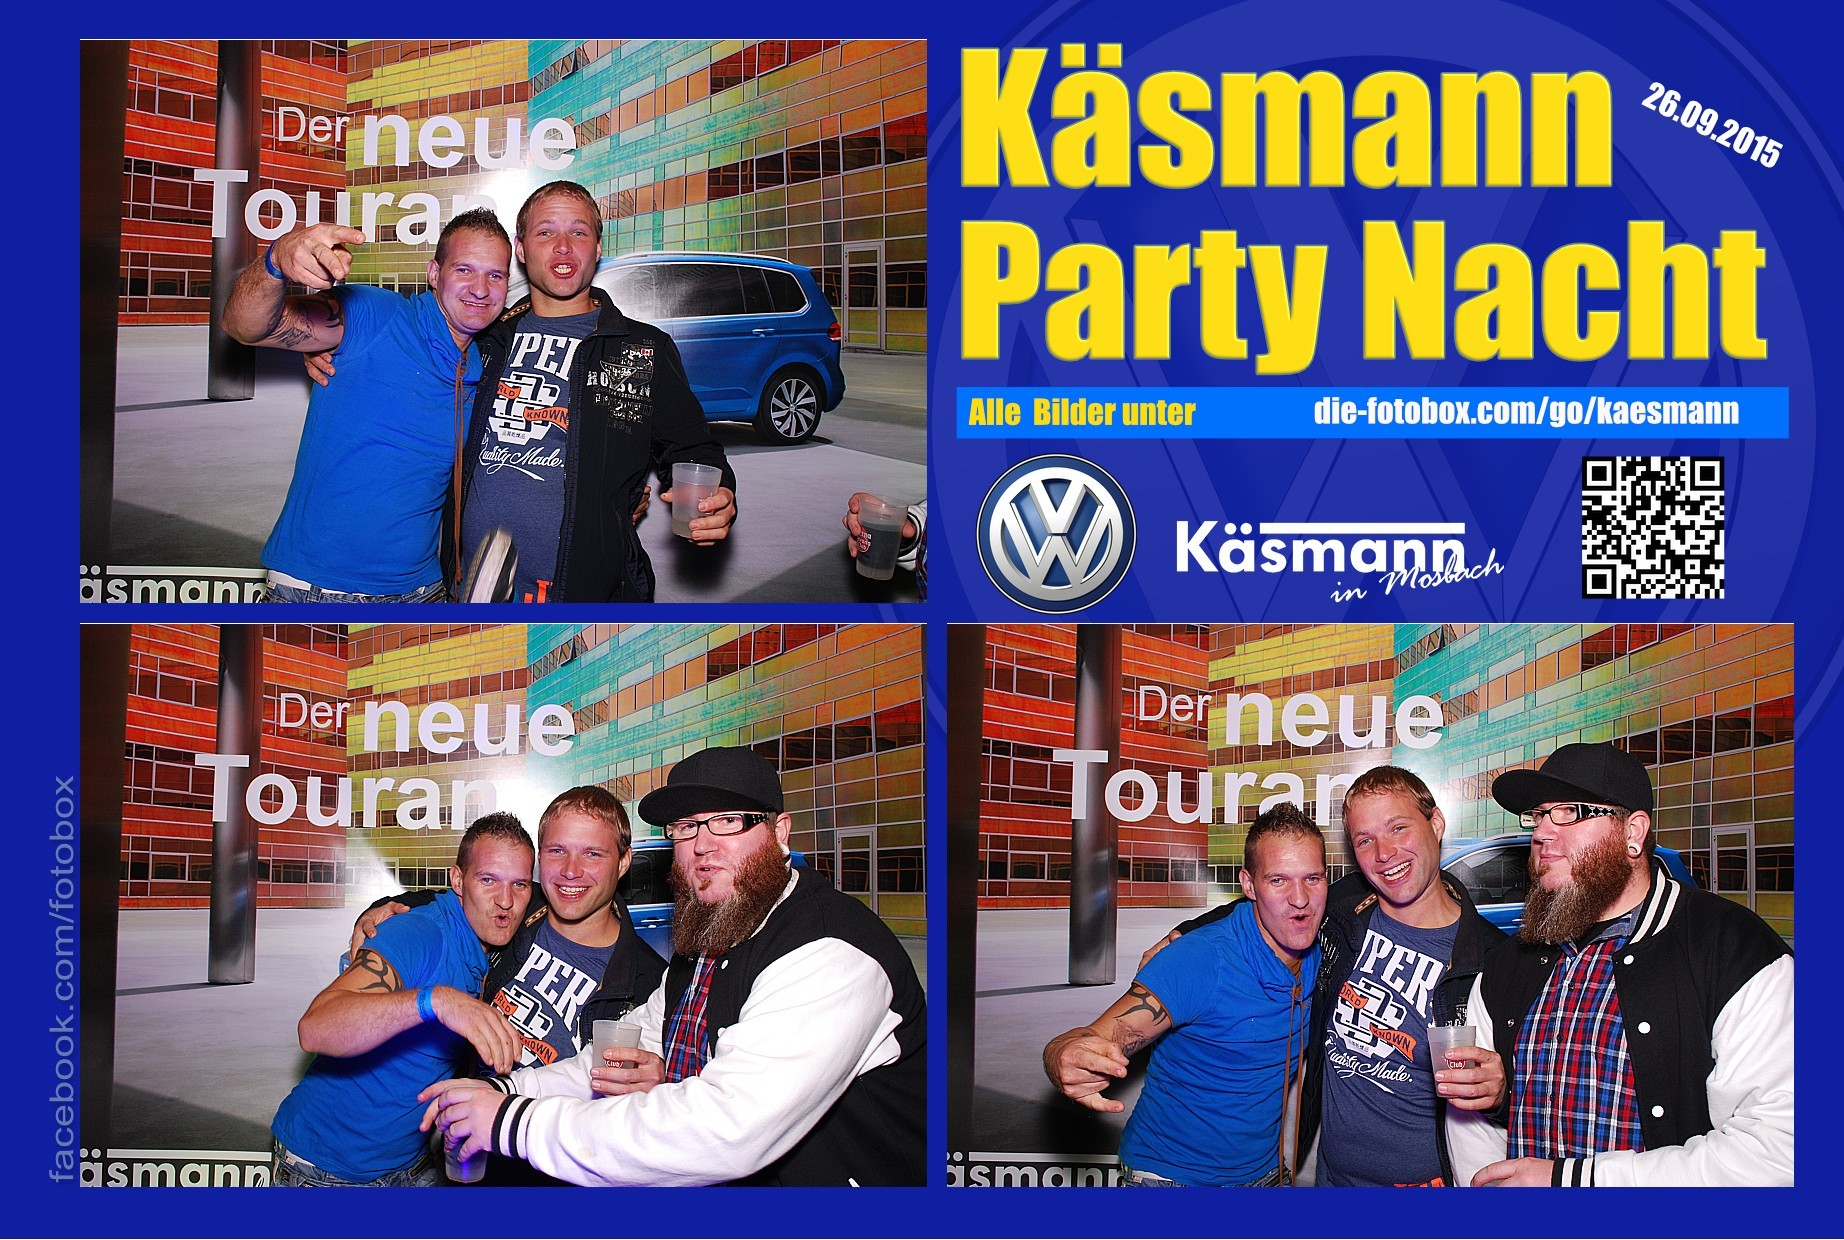 Käsmannparty 2015 - www.die-fotobox.com 00988